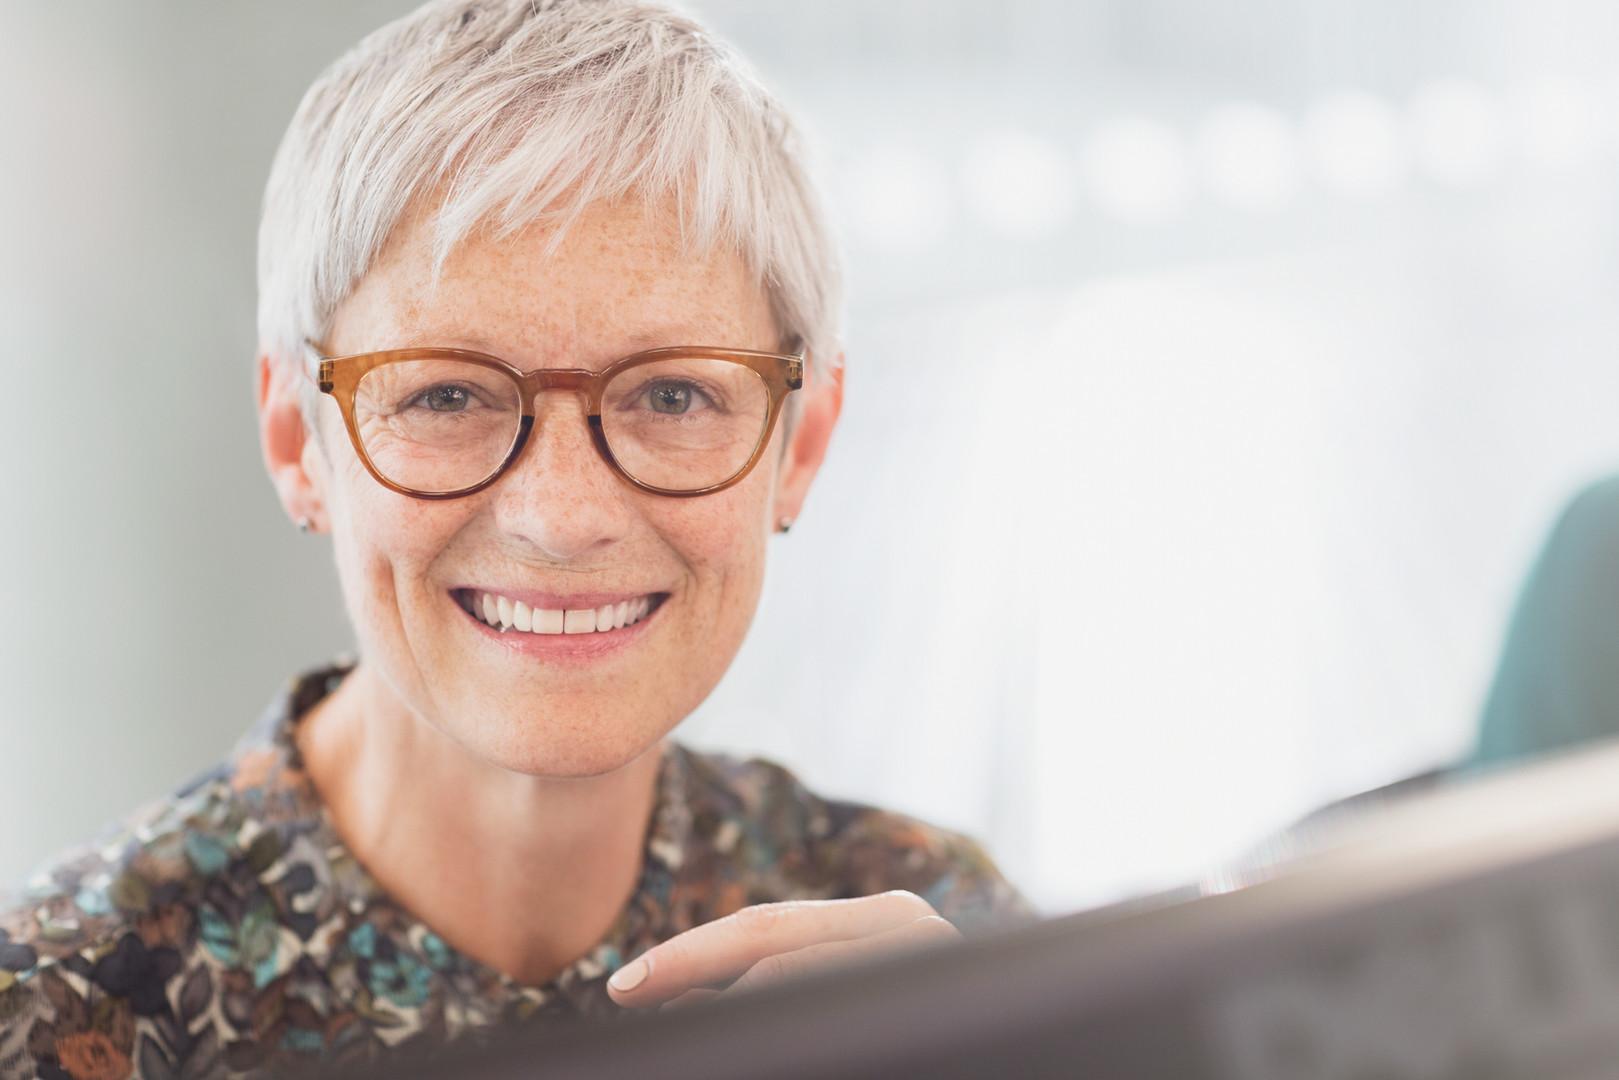 Portrait of an Attractive Senior Woman